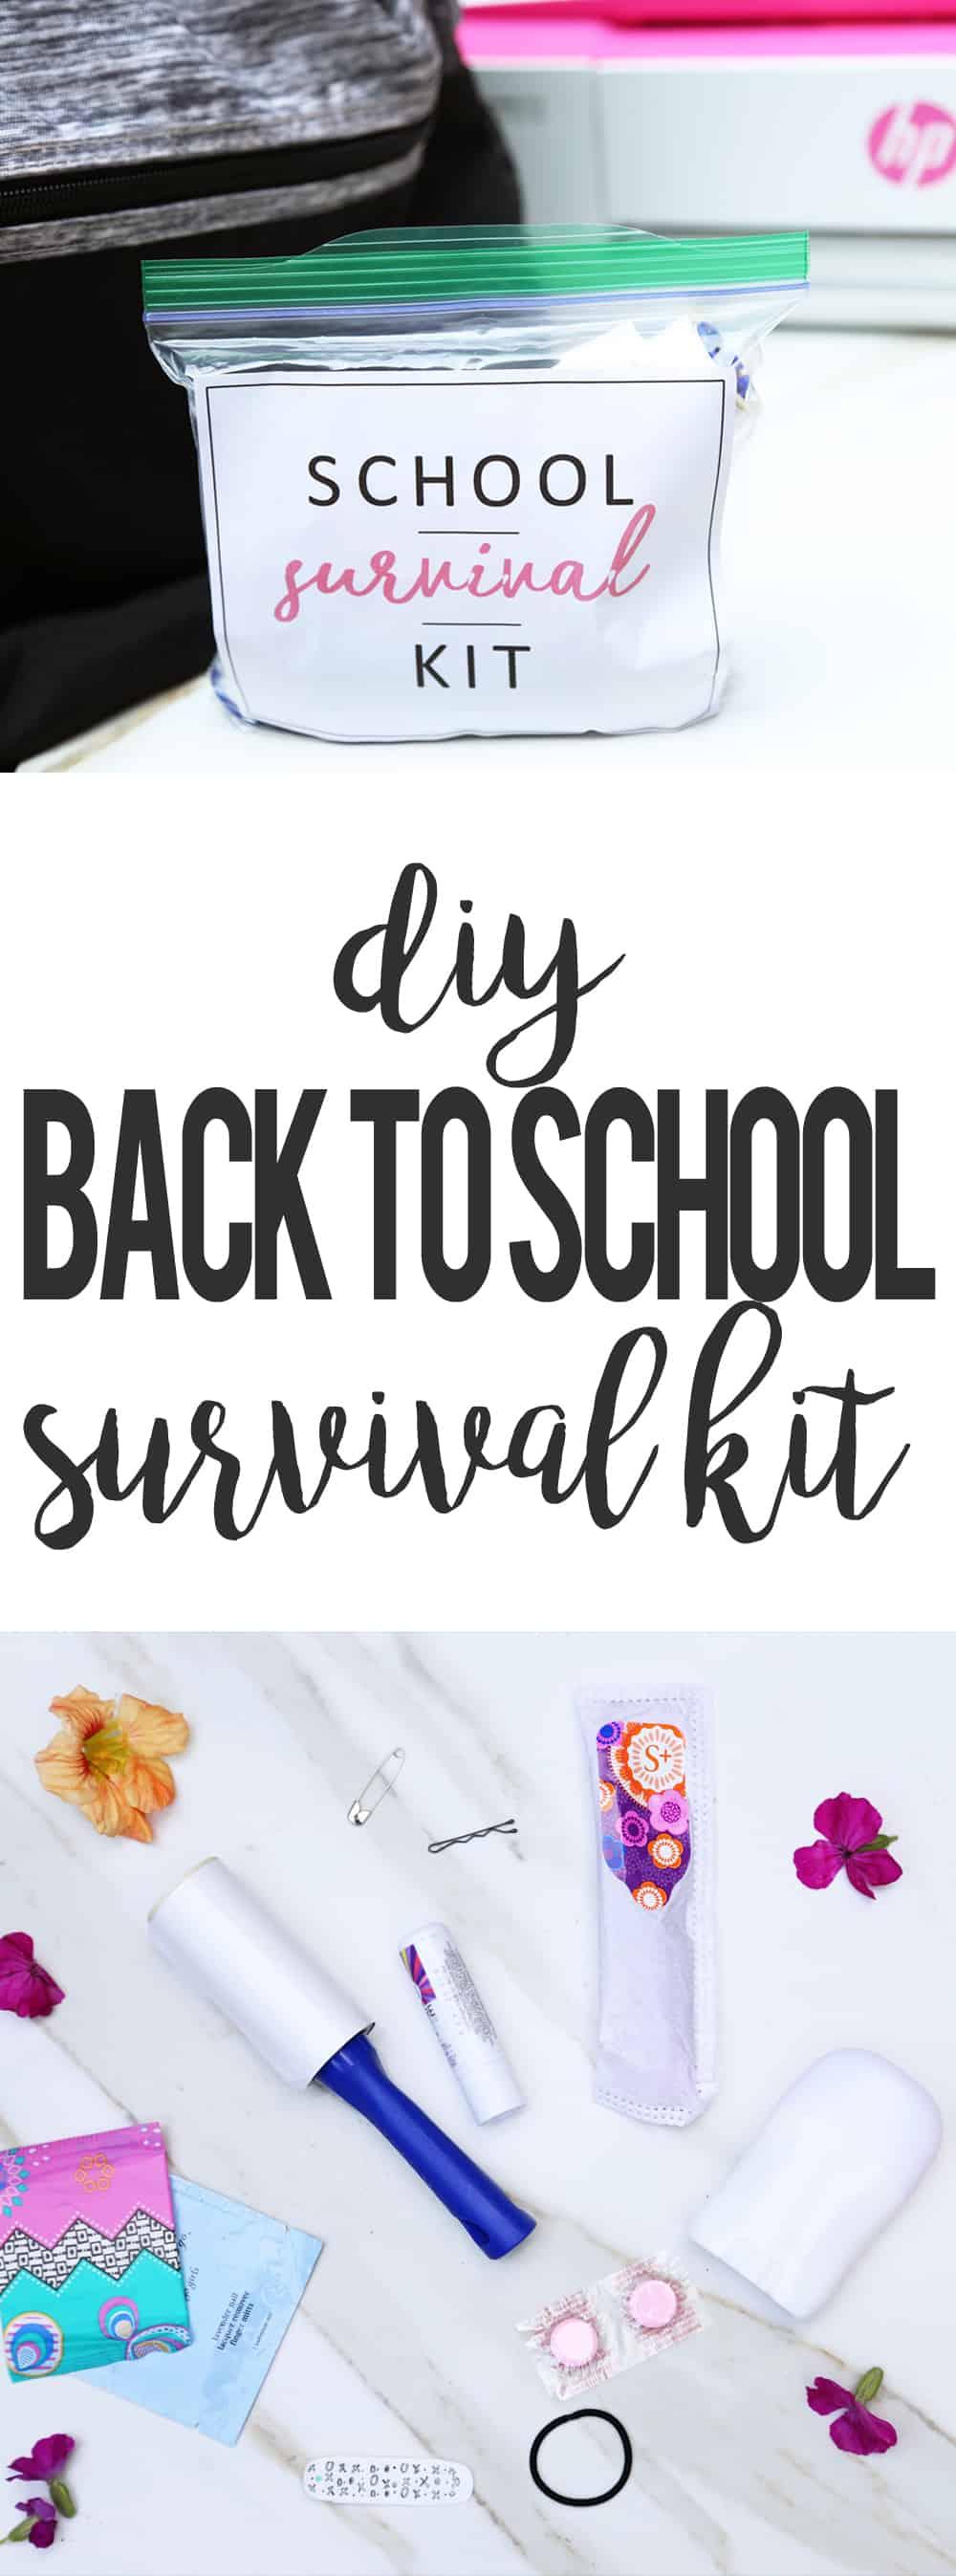 DIY SCHOOL SURVIVAL KIT | ONEARMEDMAMA.COM #CreateWithHP #ad